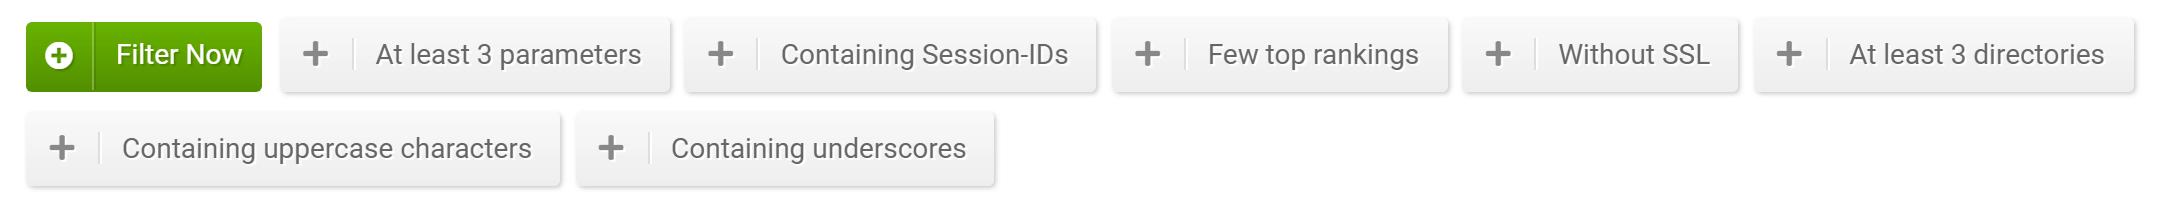 URLs filters in the SISTRIX Toolbox